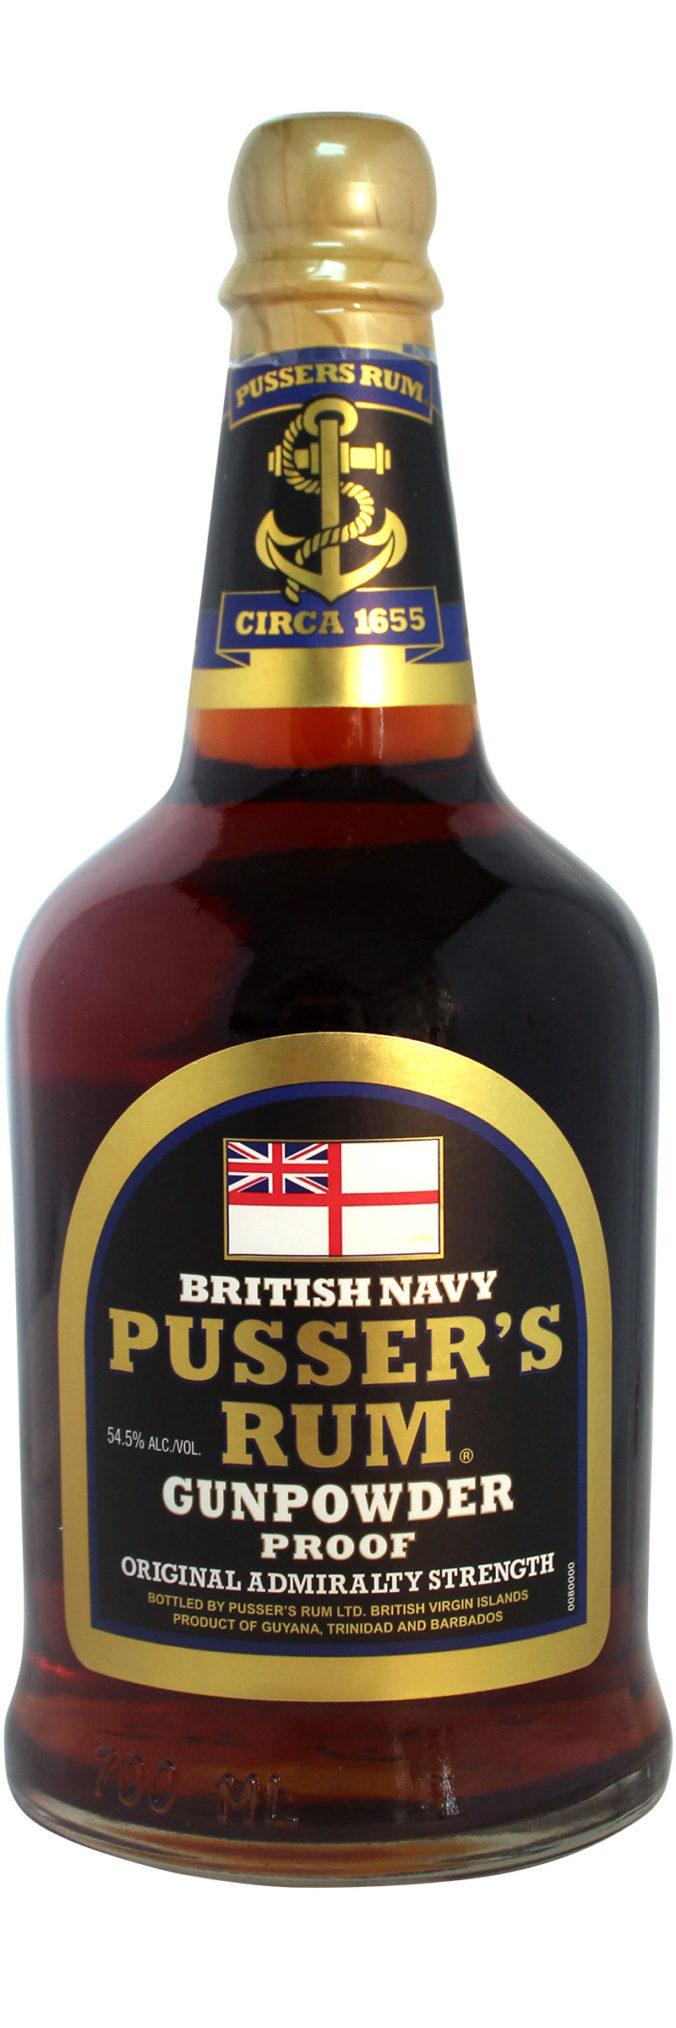 Pusser's Gunpowder Proof Rum is bottled at 54.5%